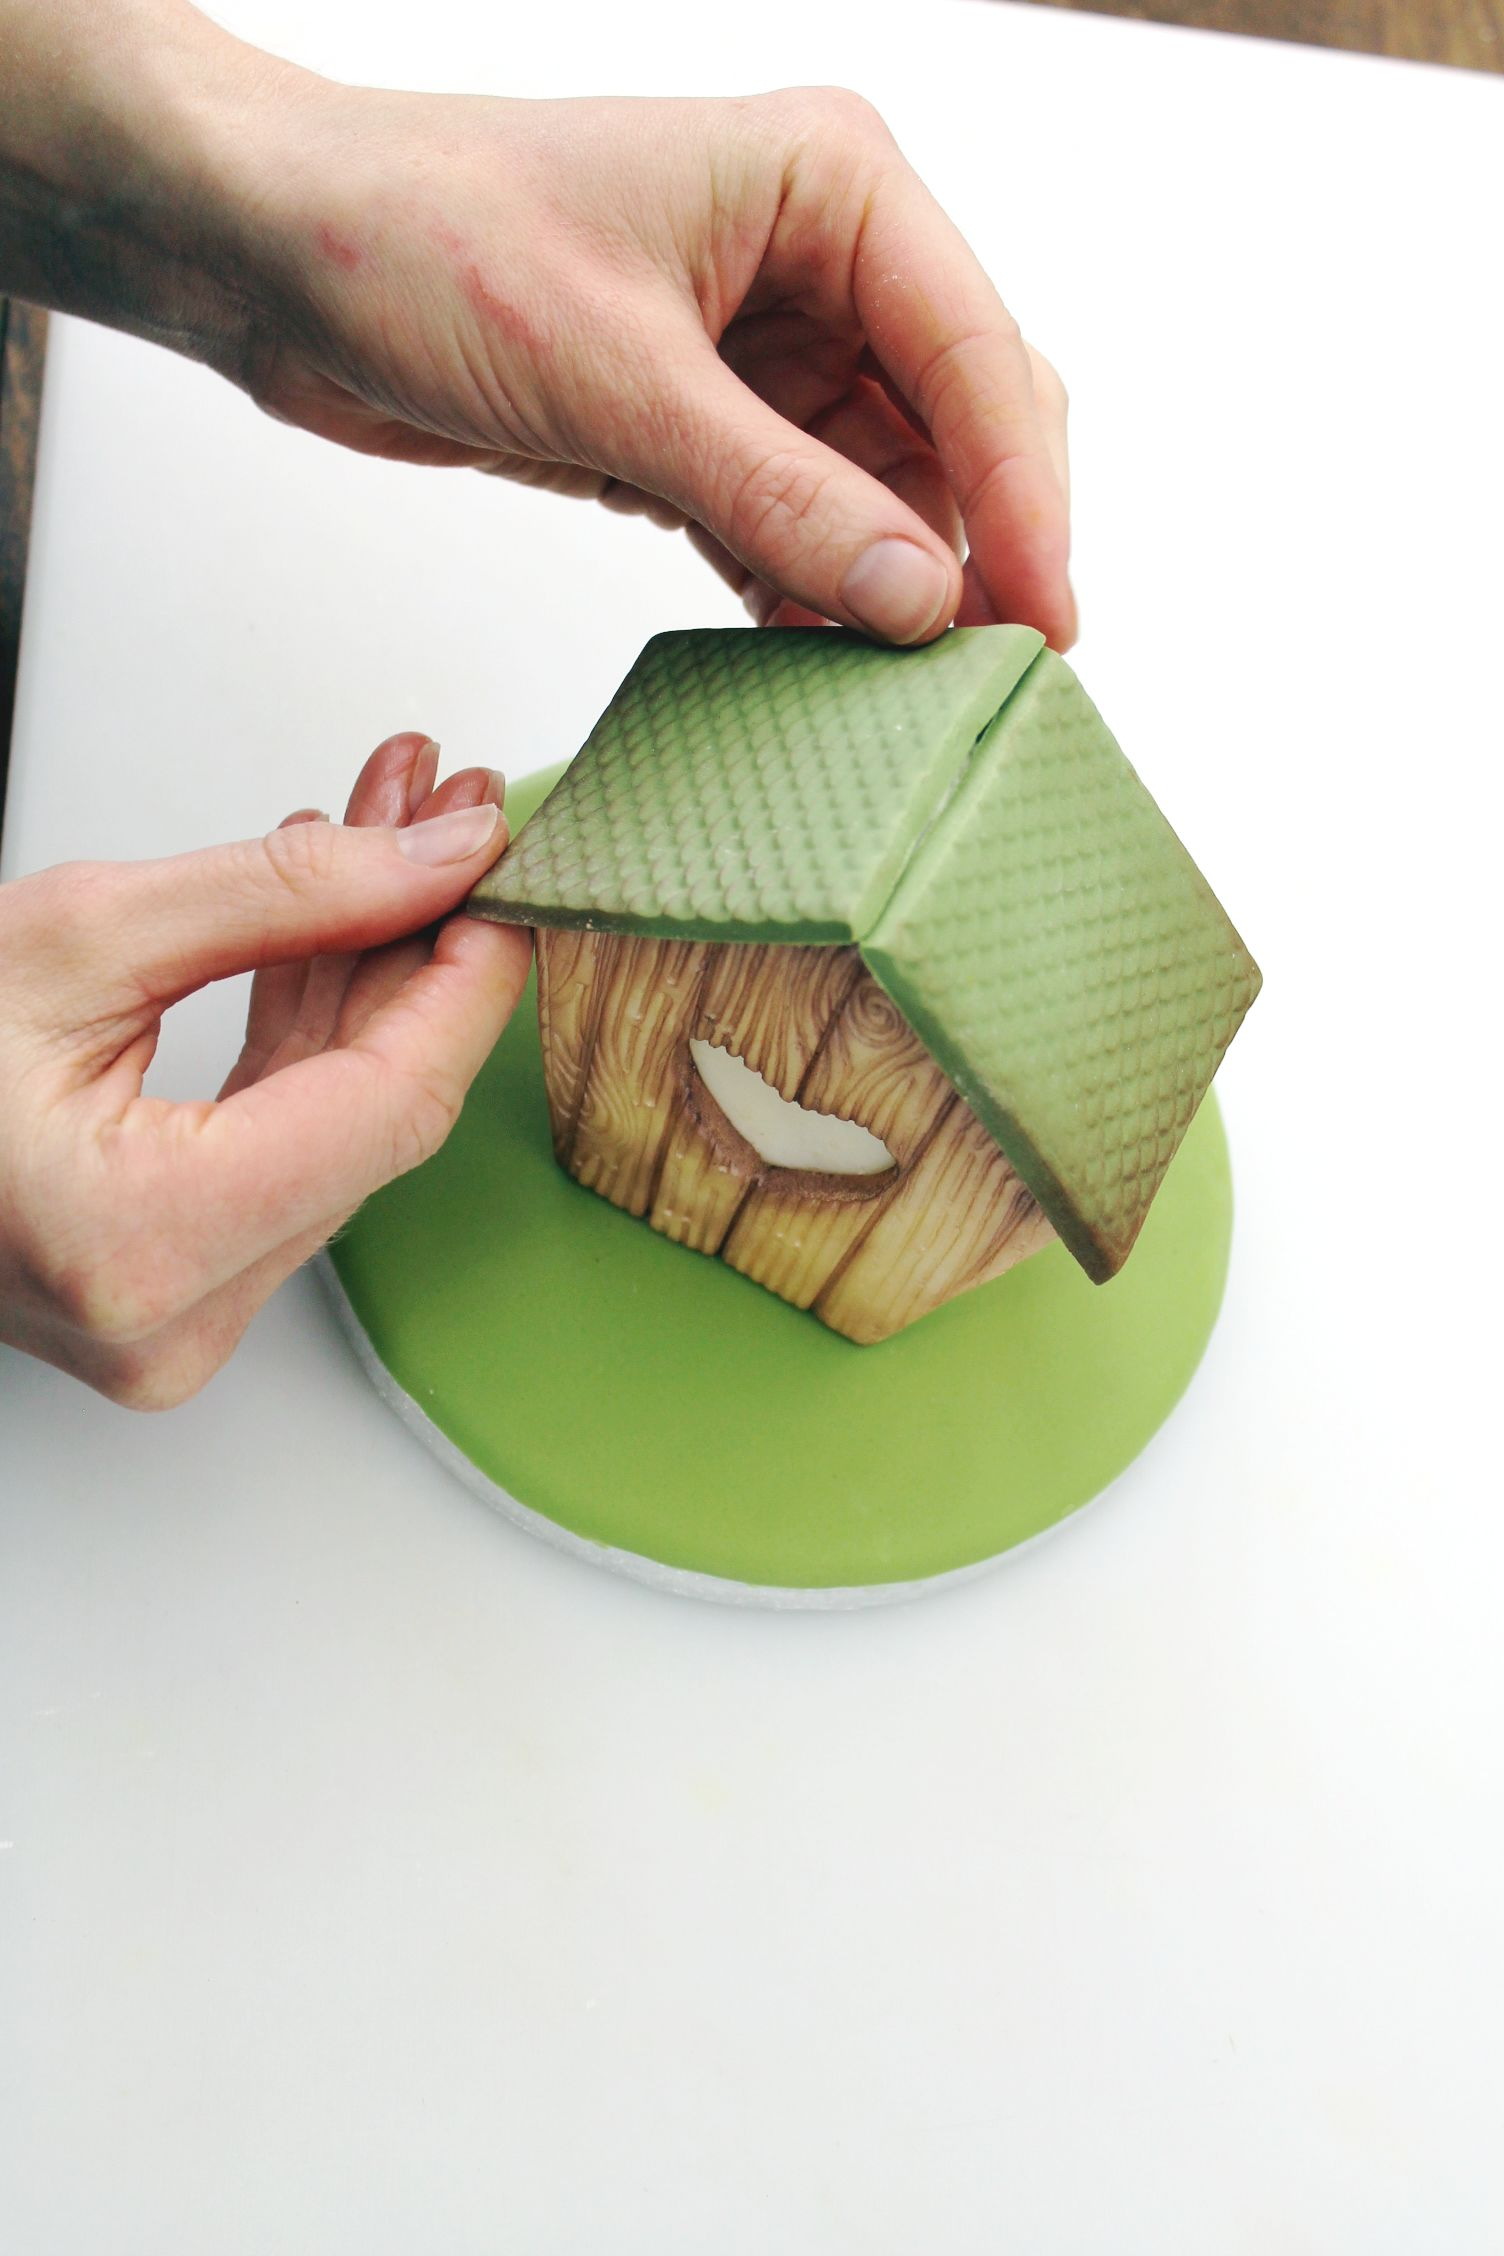 How to Make a bird house cupcake